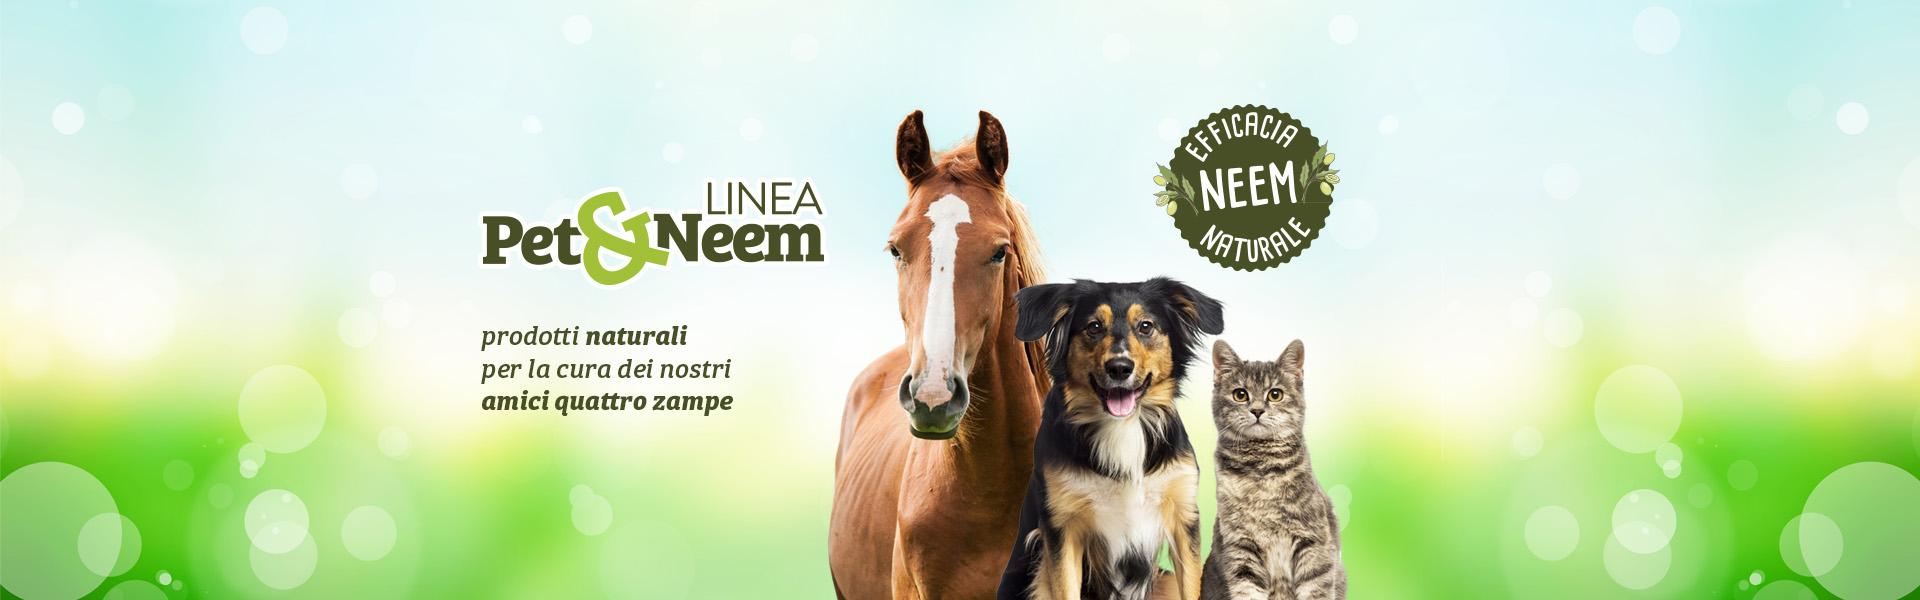 Slide_linea_Pet_Neem